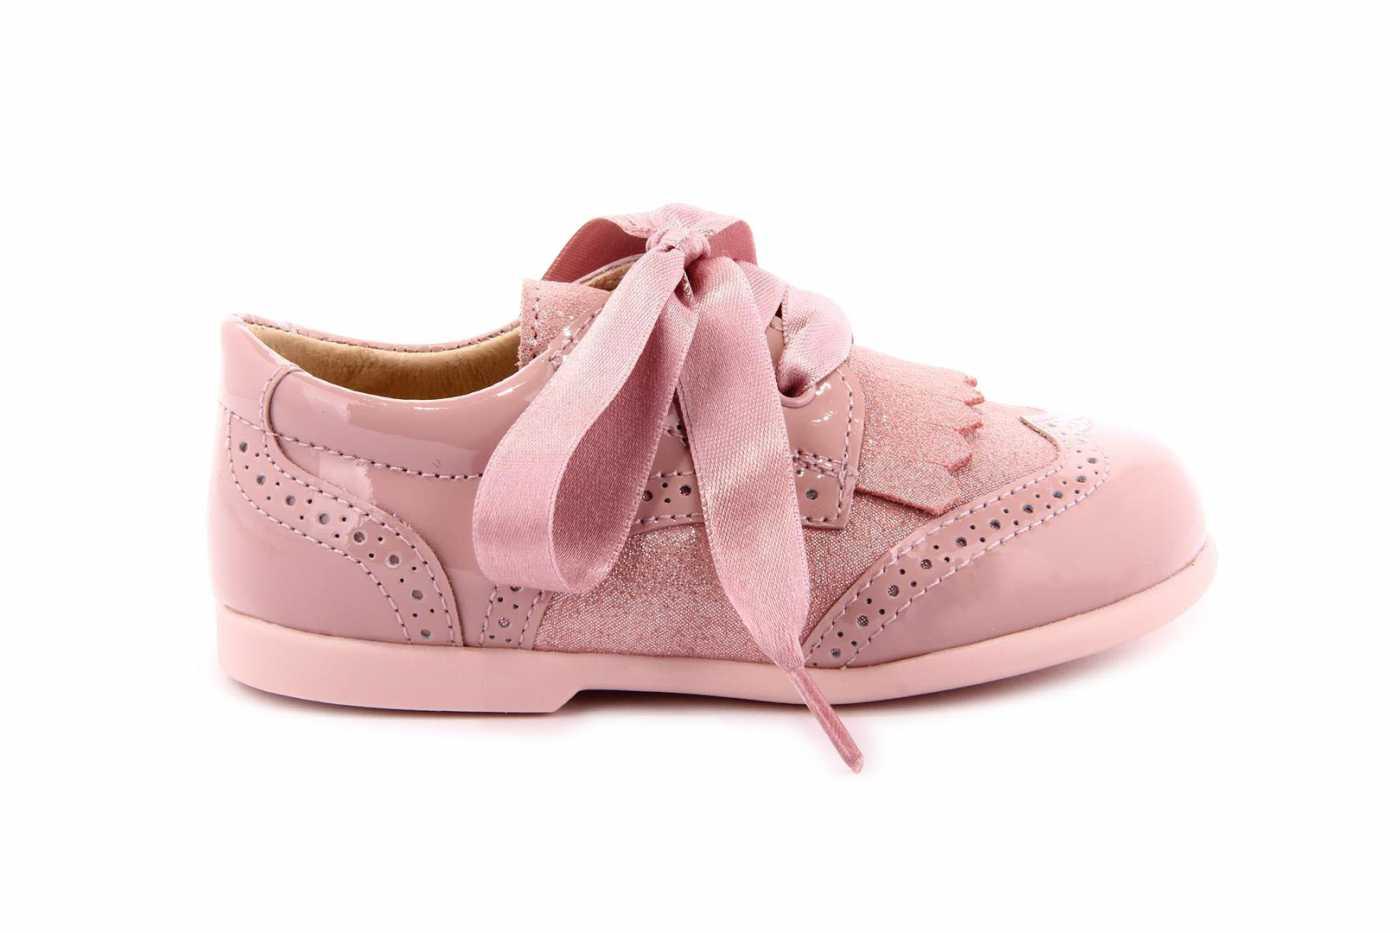 63dbaebc7 Comprar zapato tipo PREANDANTE NIÑA estilo BLUCHER COLOR ROSA CHAROL ...